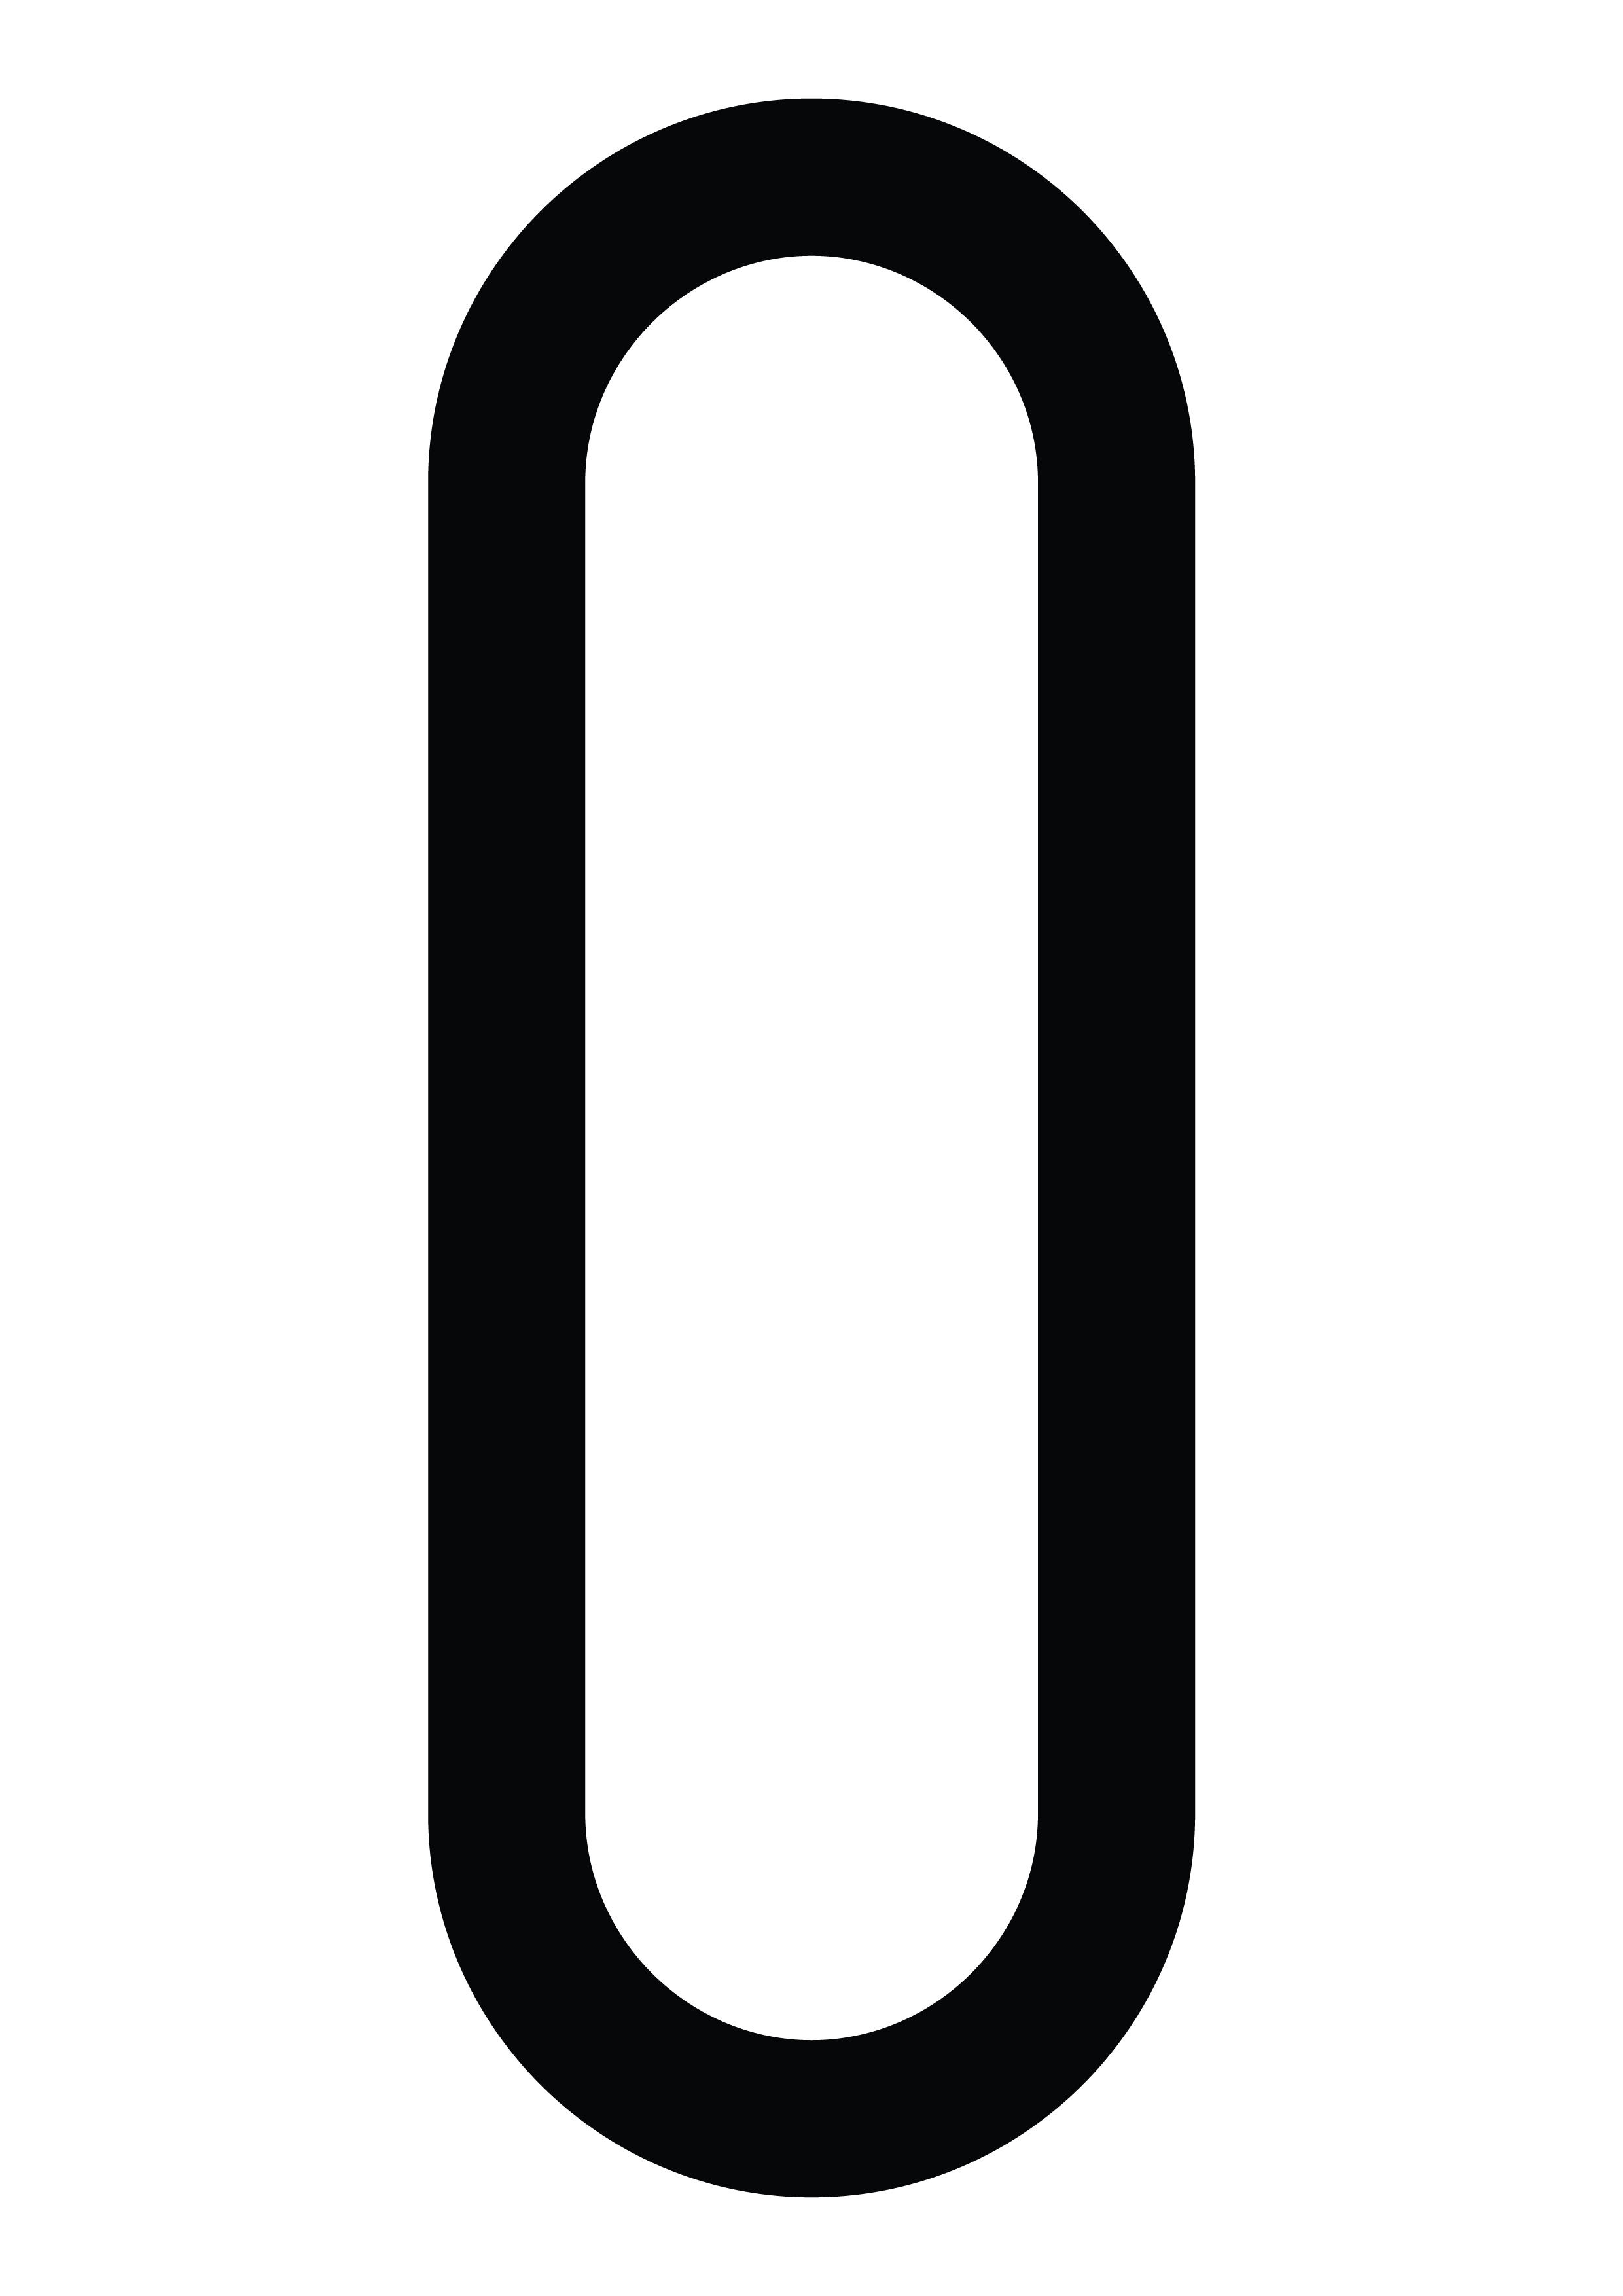 BINARY CODE-05.png